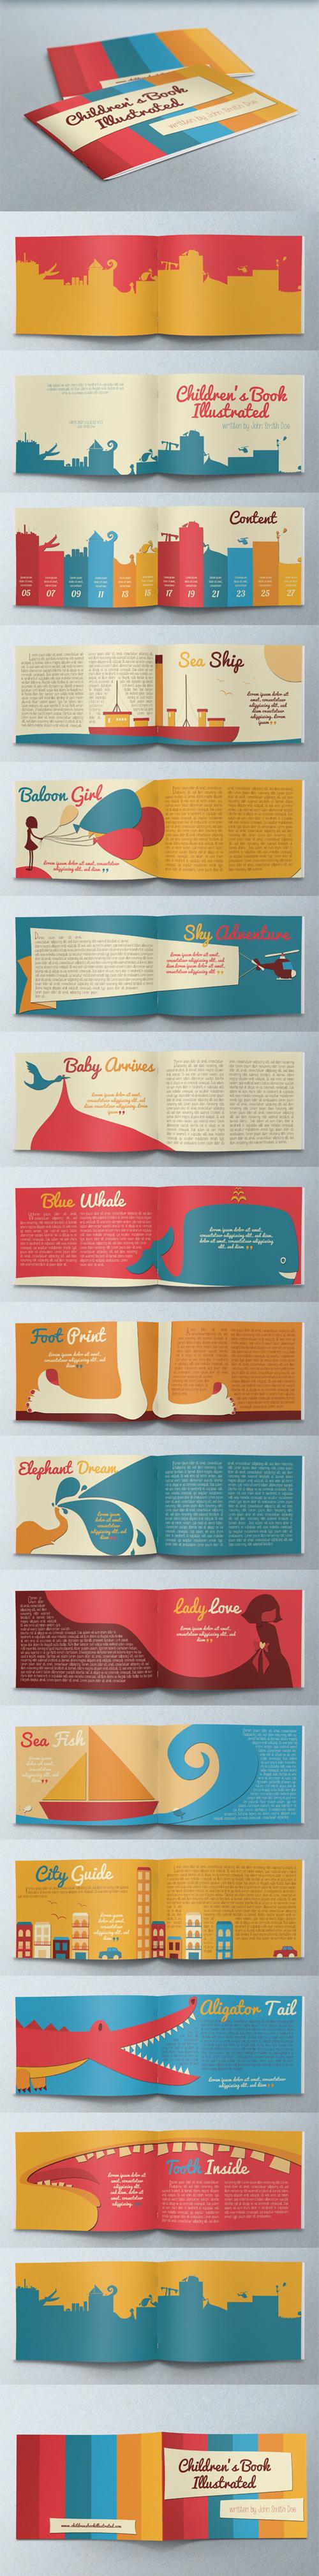 Children's Book Illustrated